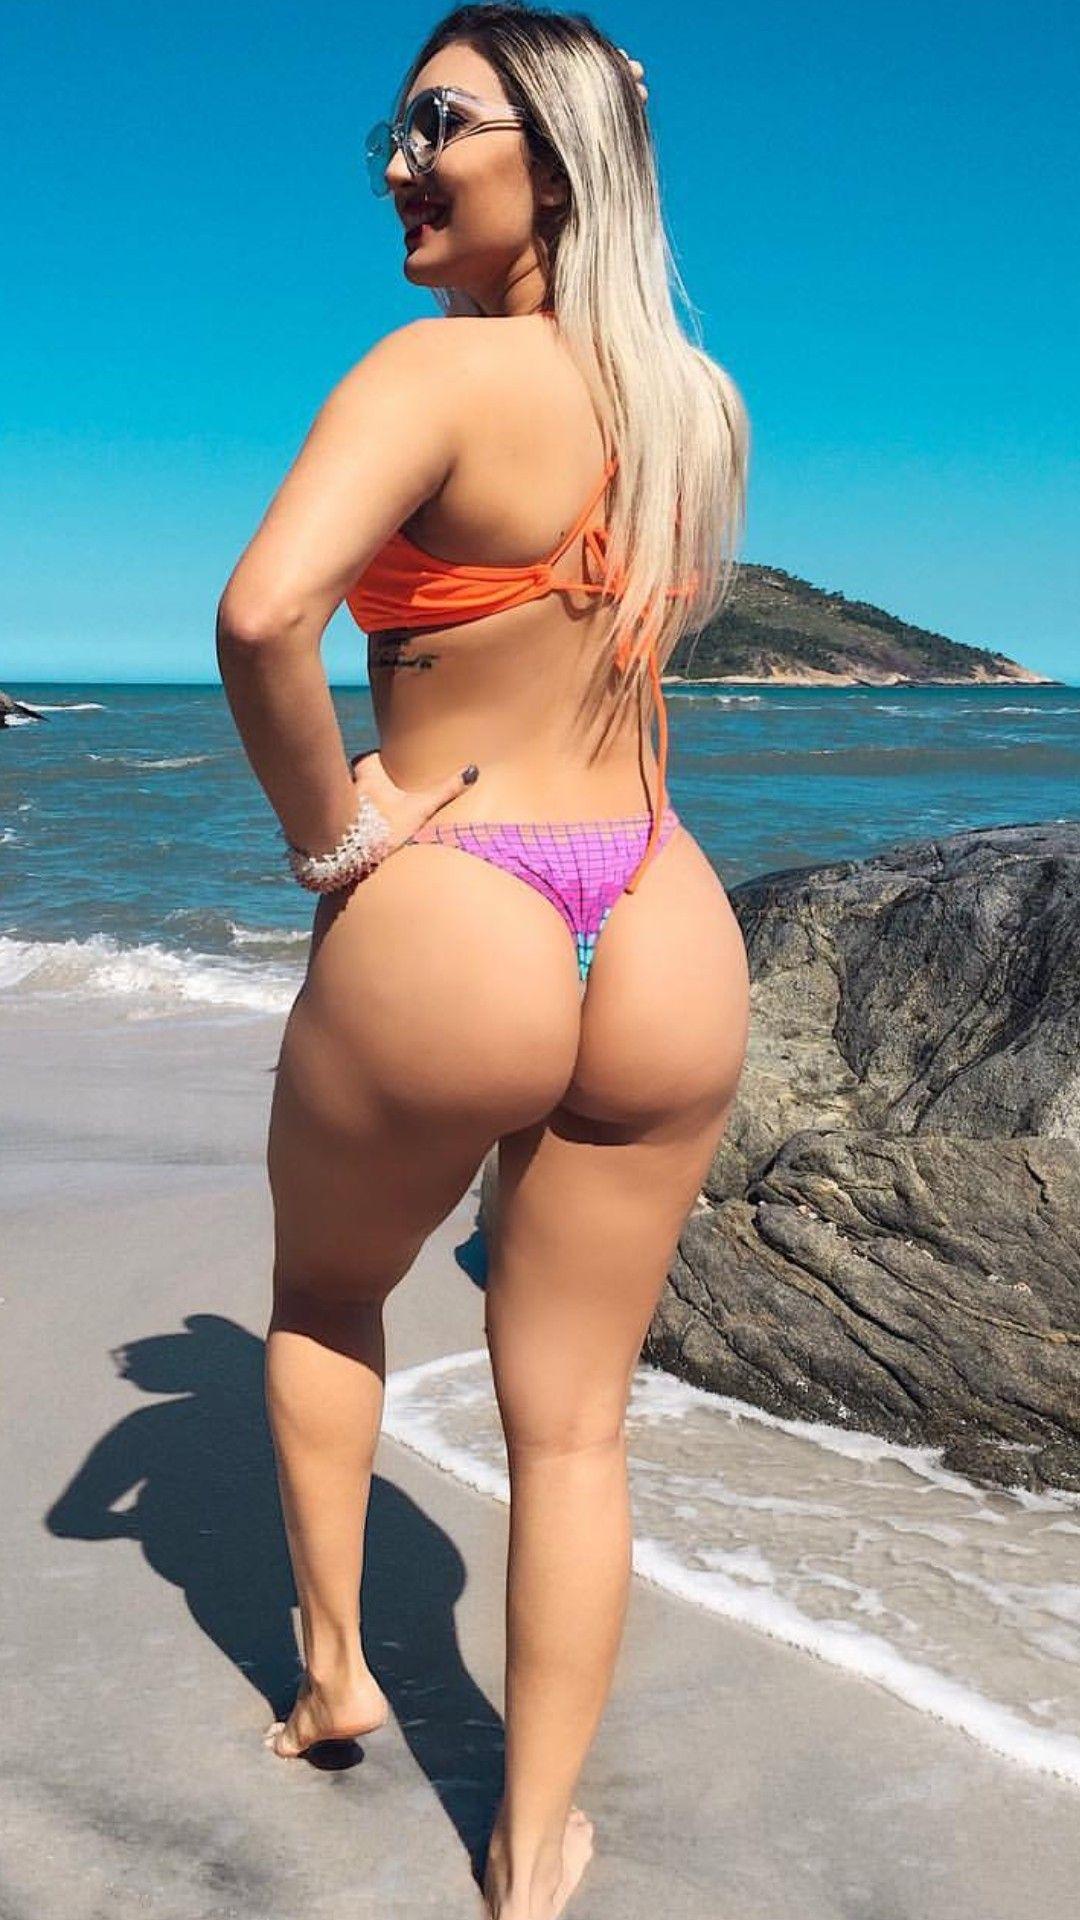 pinbruno on curvas   pinterest   bikini babes, curves and pool wear